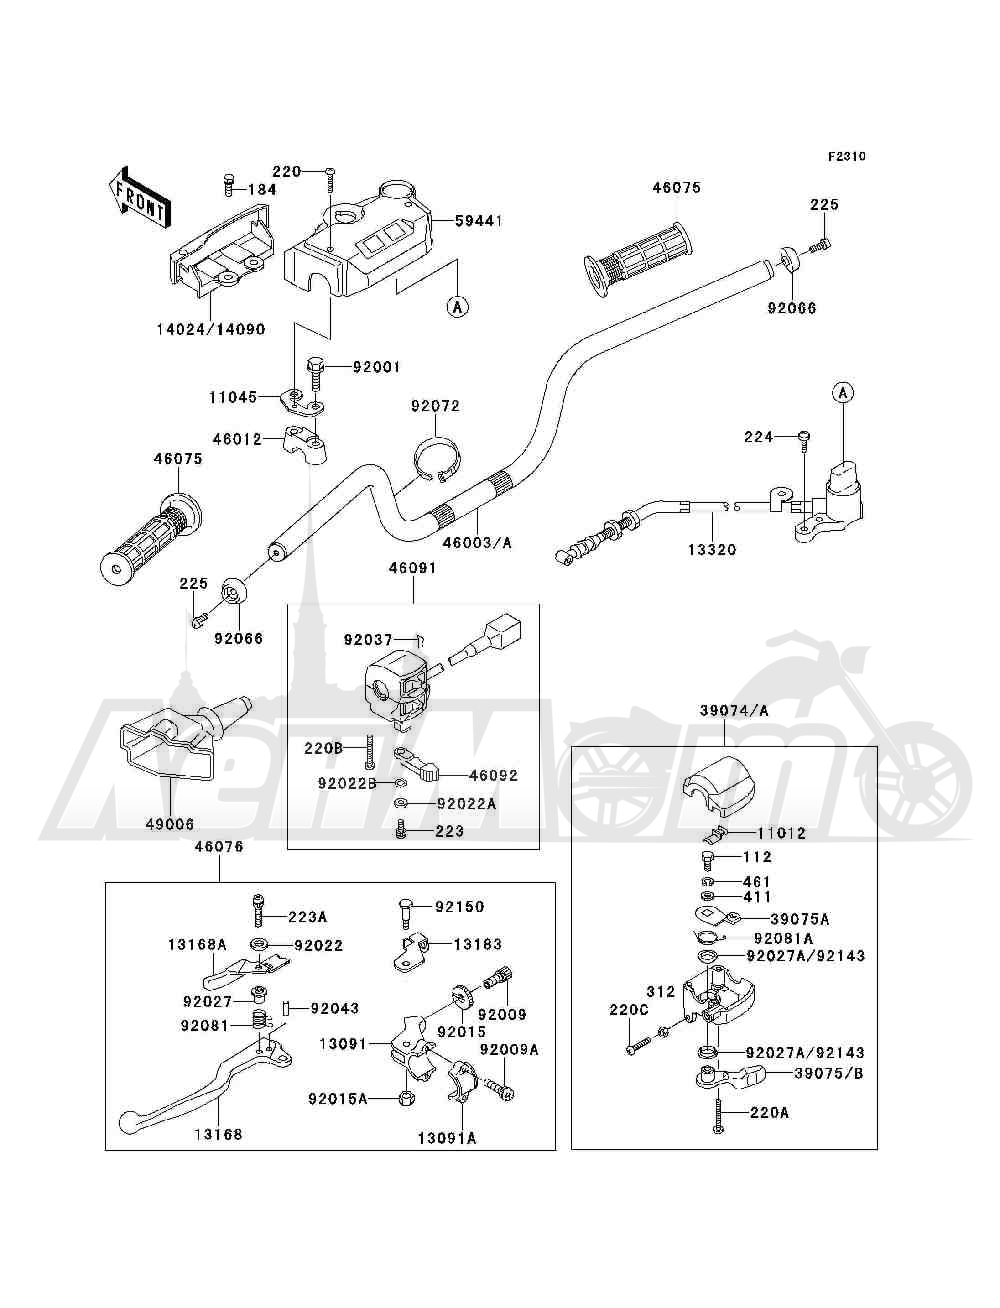 Запчасти для Квадроцикла Kawasaki 1993 BAYOU 300 4X4 (KLF300-C5) Раздел: HANDLEBAR | руль